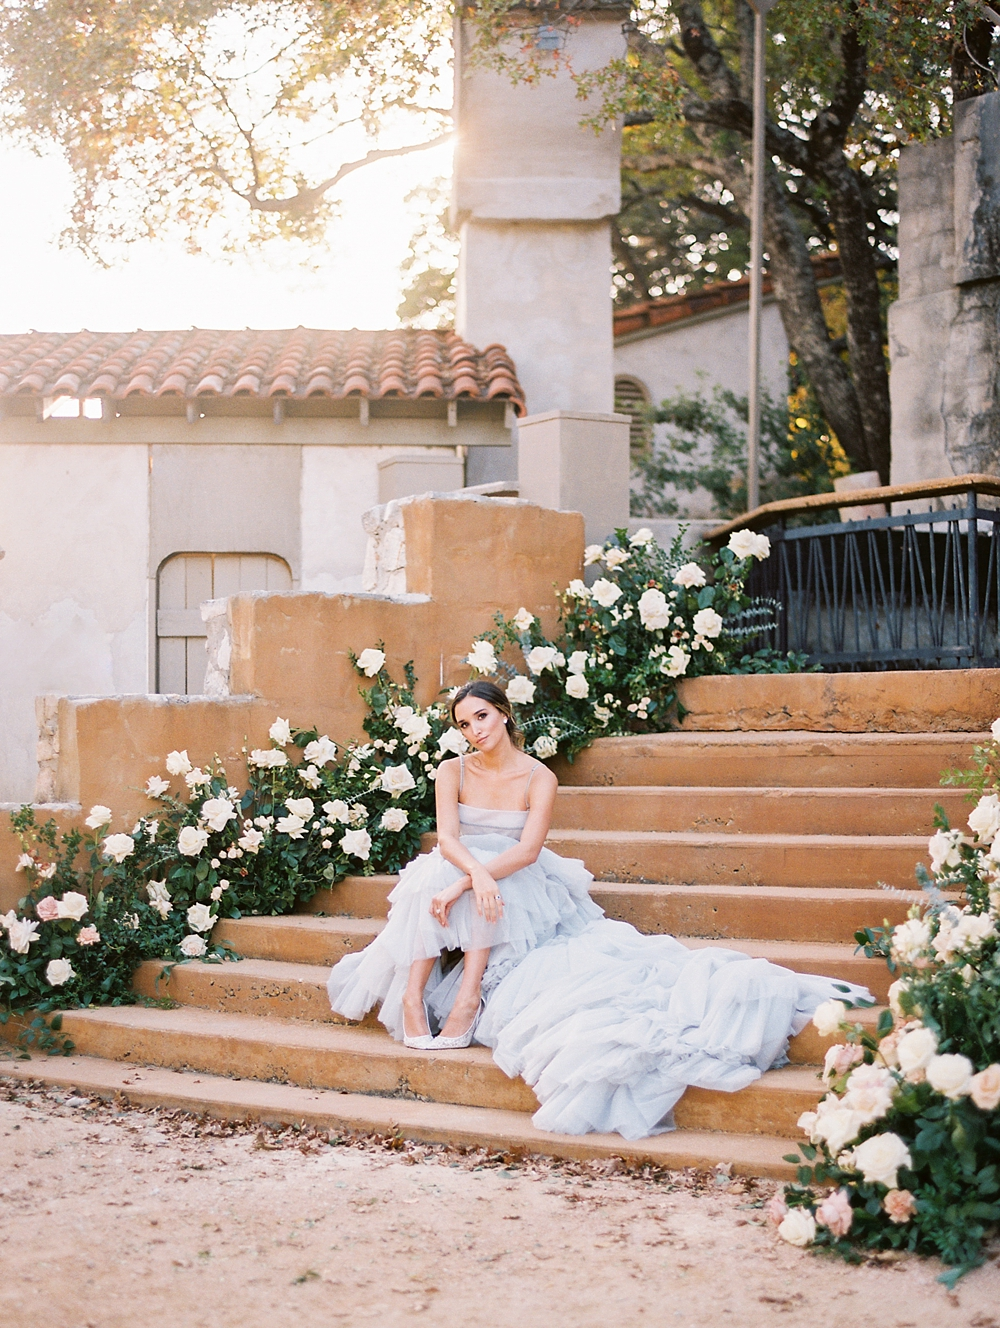 kristin-la-voie-photography-Austin-Wedding-Photographer-Villa-Antonia-8